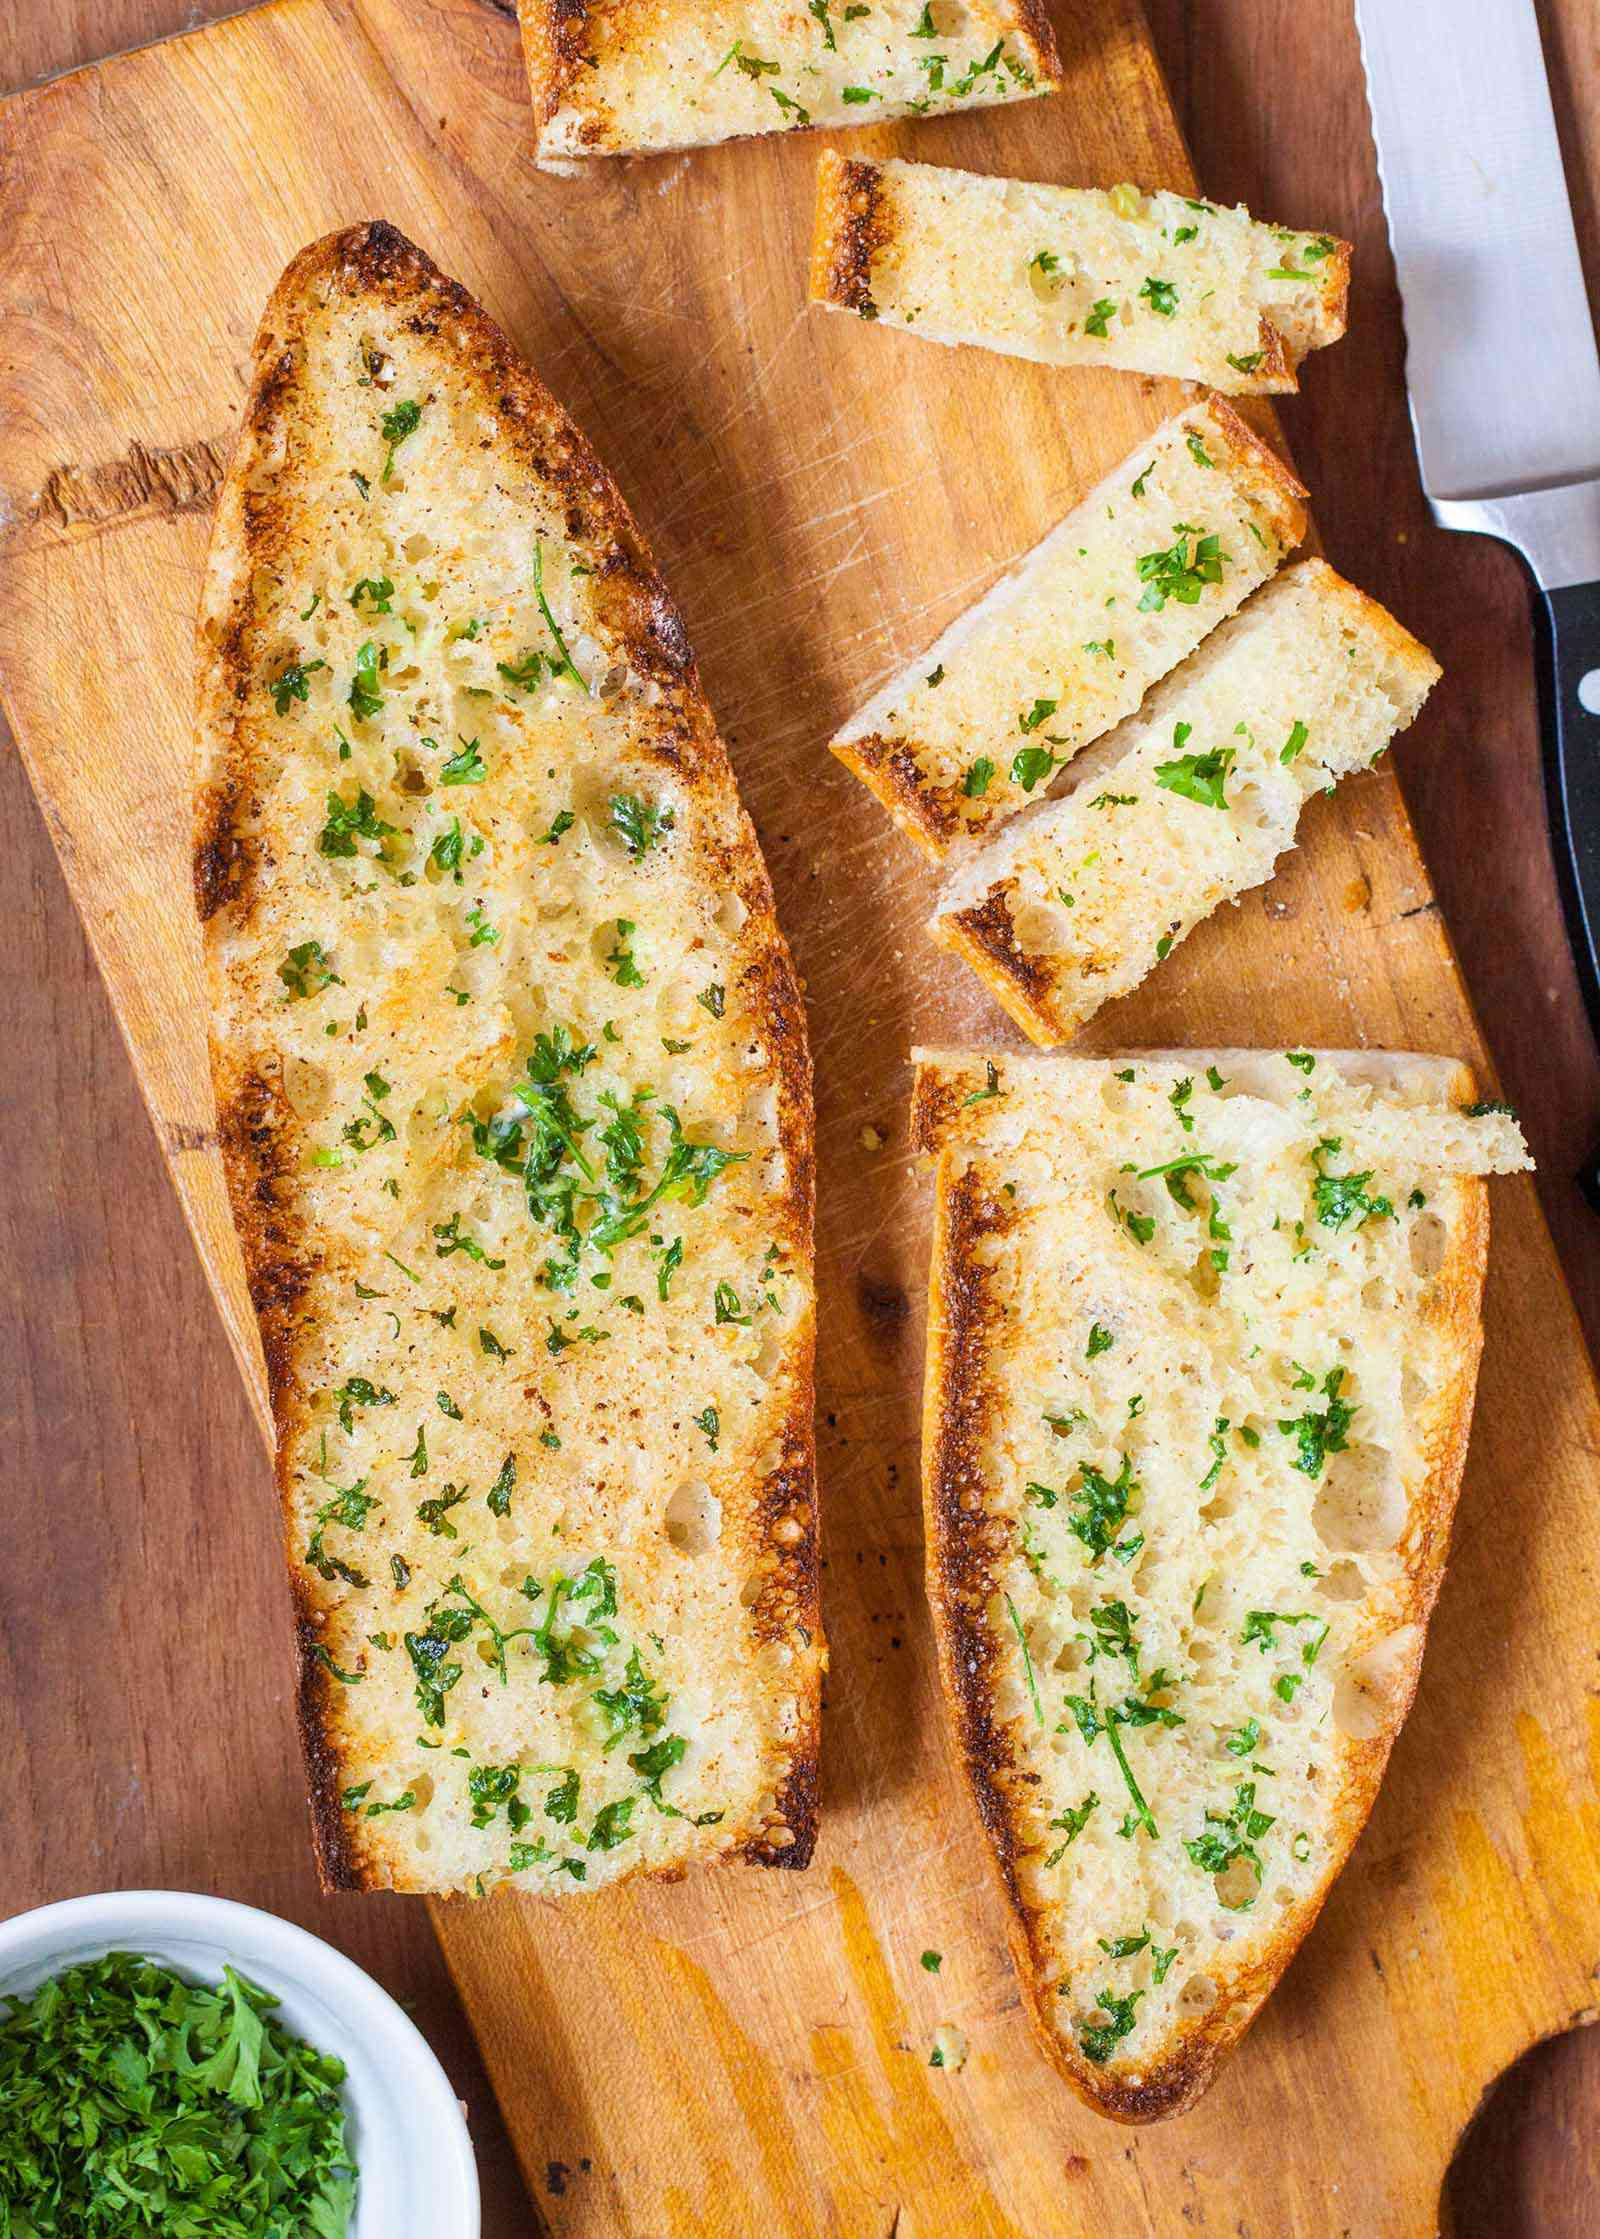 How to Make Garlic Bread - soft or crispy